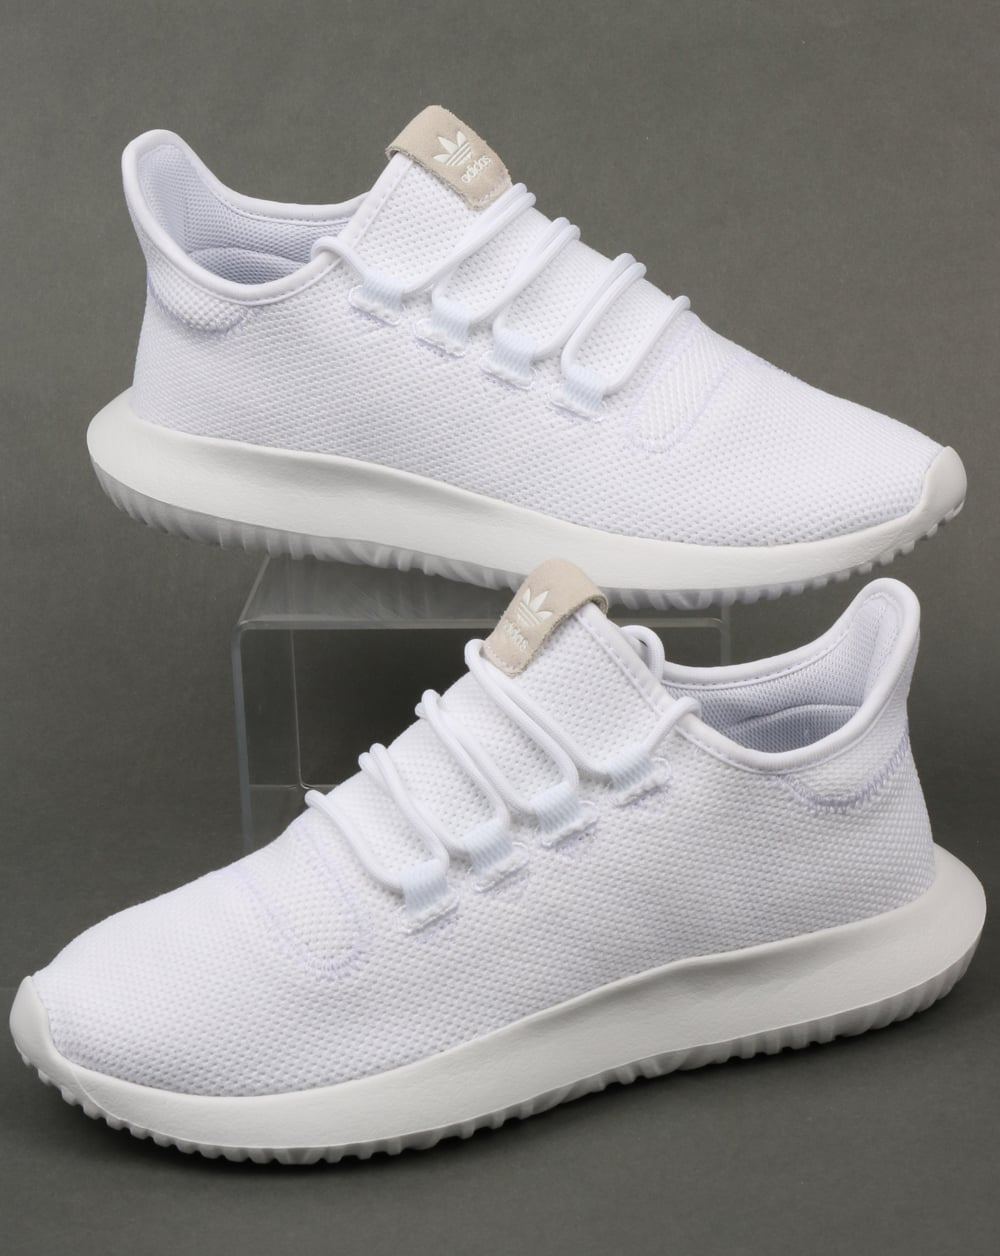 adidas tubular shadow trainers white